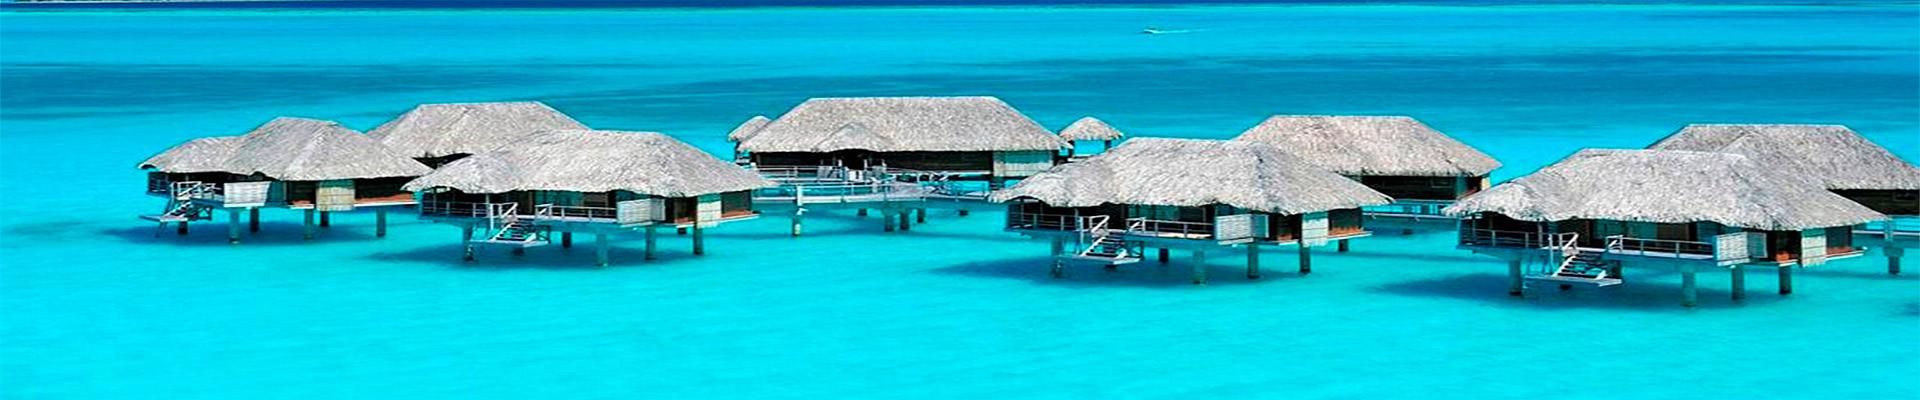 Ilhas do Tahiti – Papeete, Bora Bora e Rangiroa